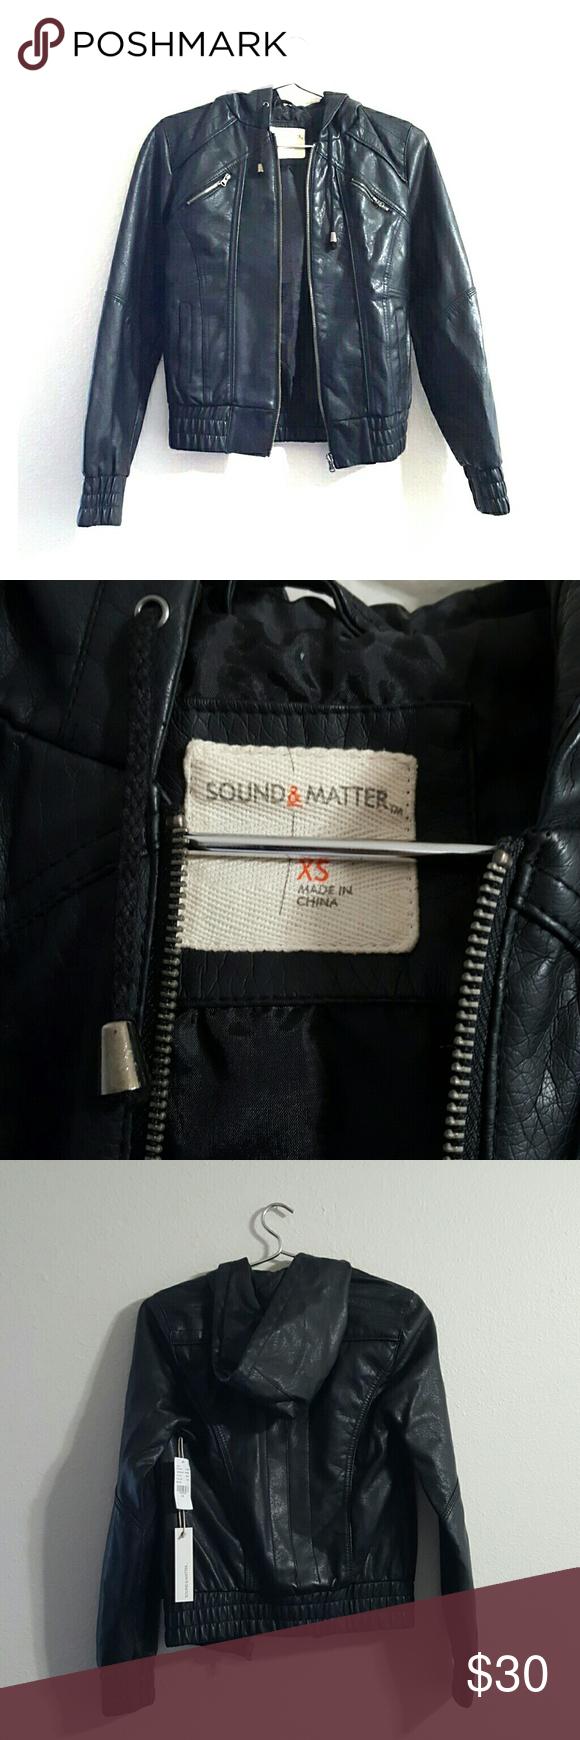 Sound & Matter faux leather jacket NWT Leather jacket